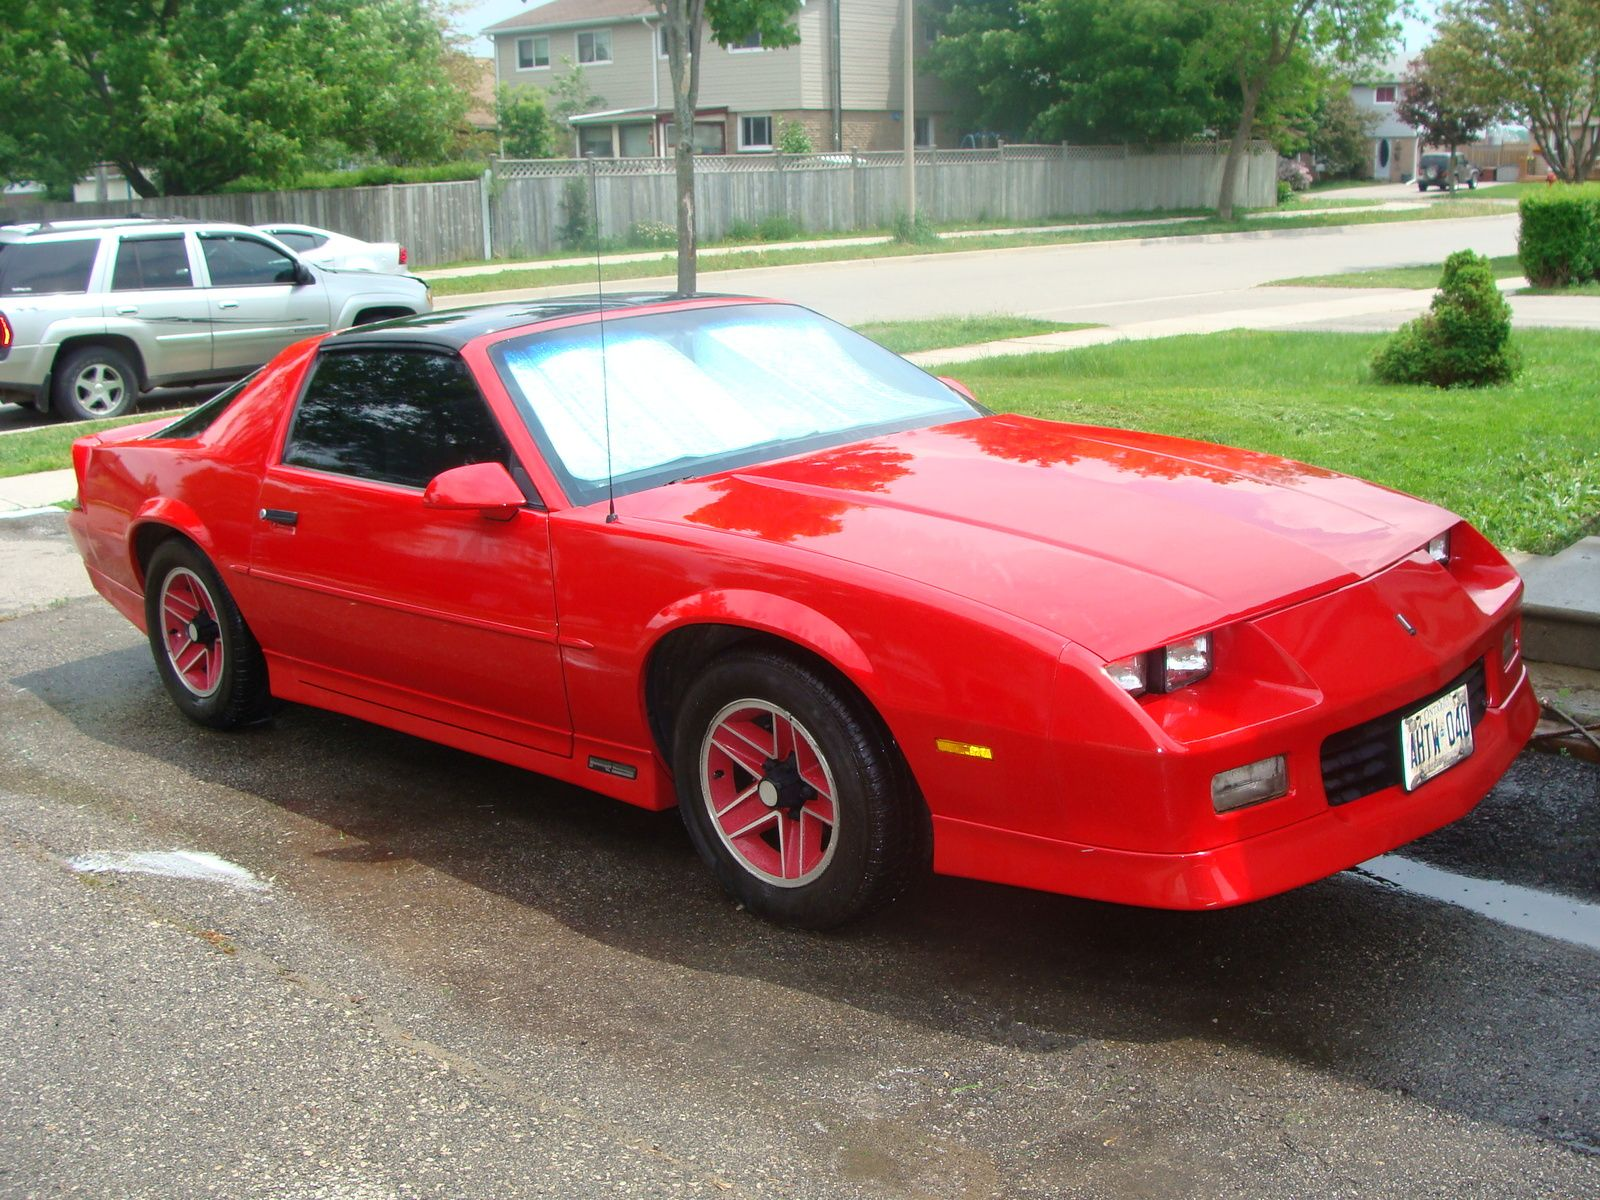 1989 camaro | 1989 chevrolet camaro rs coupe picture, exterior